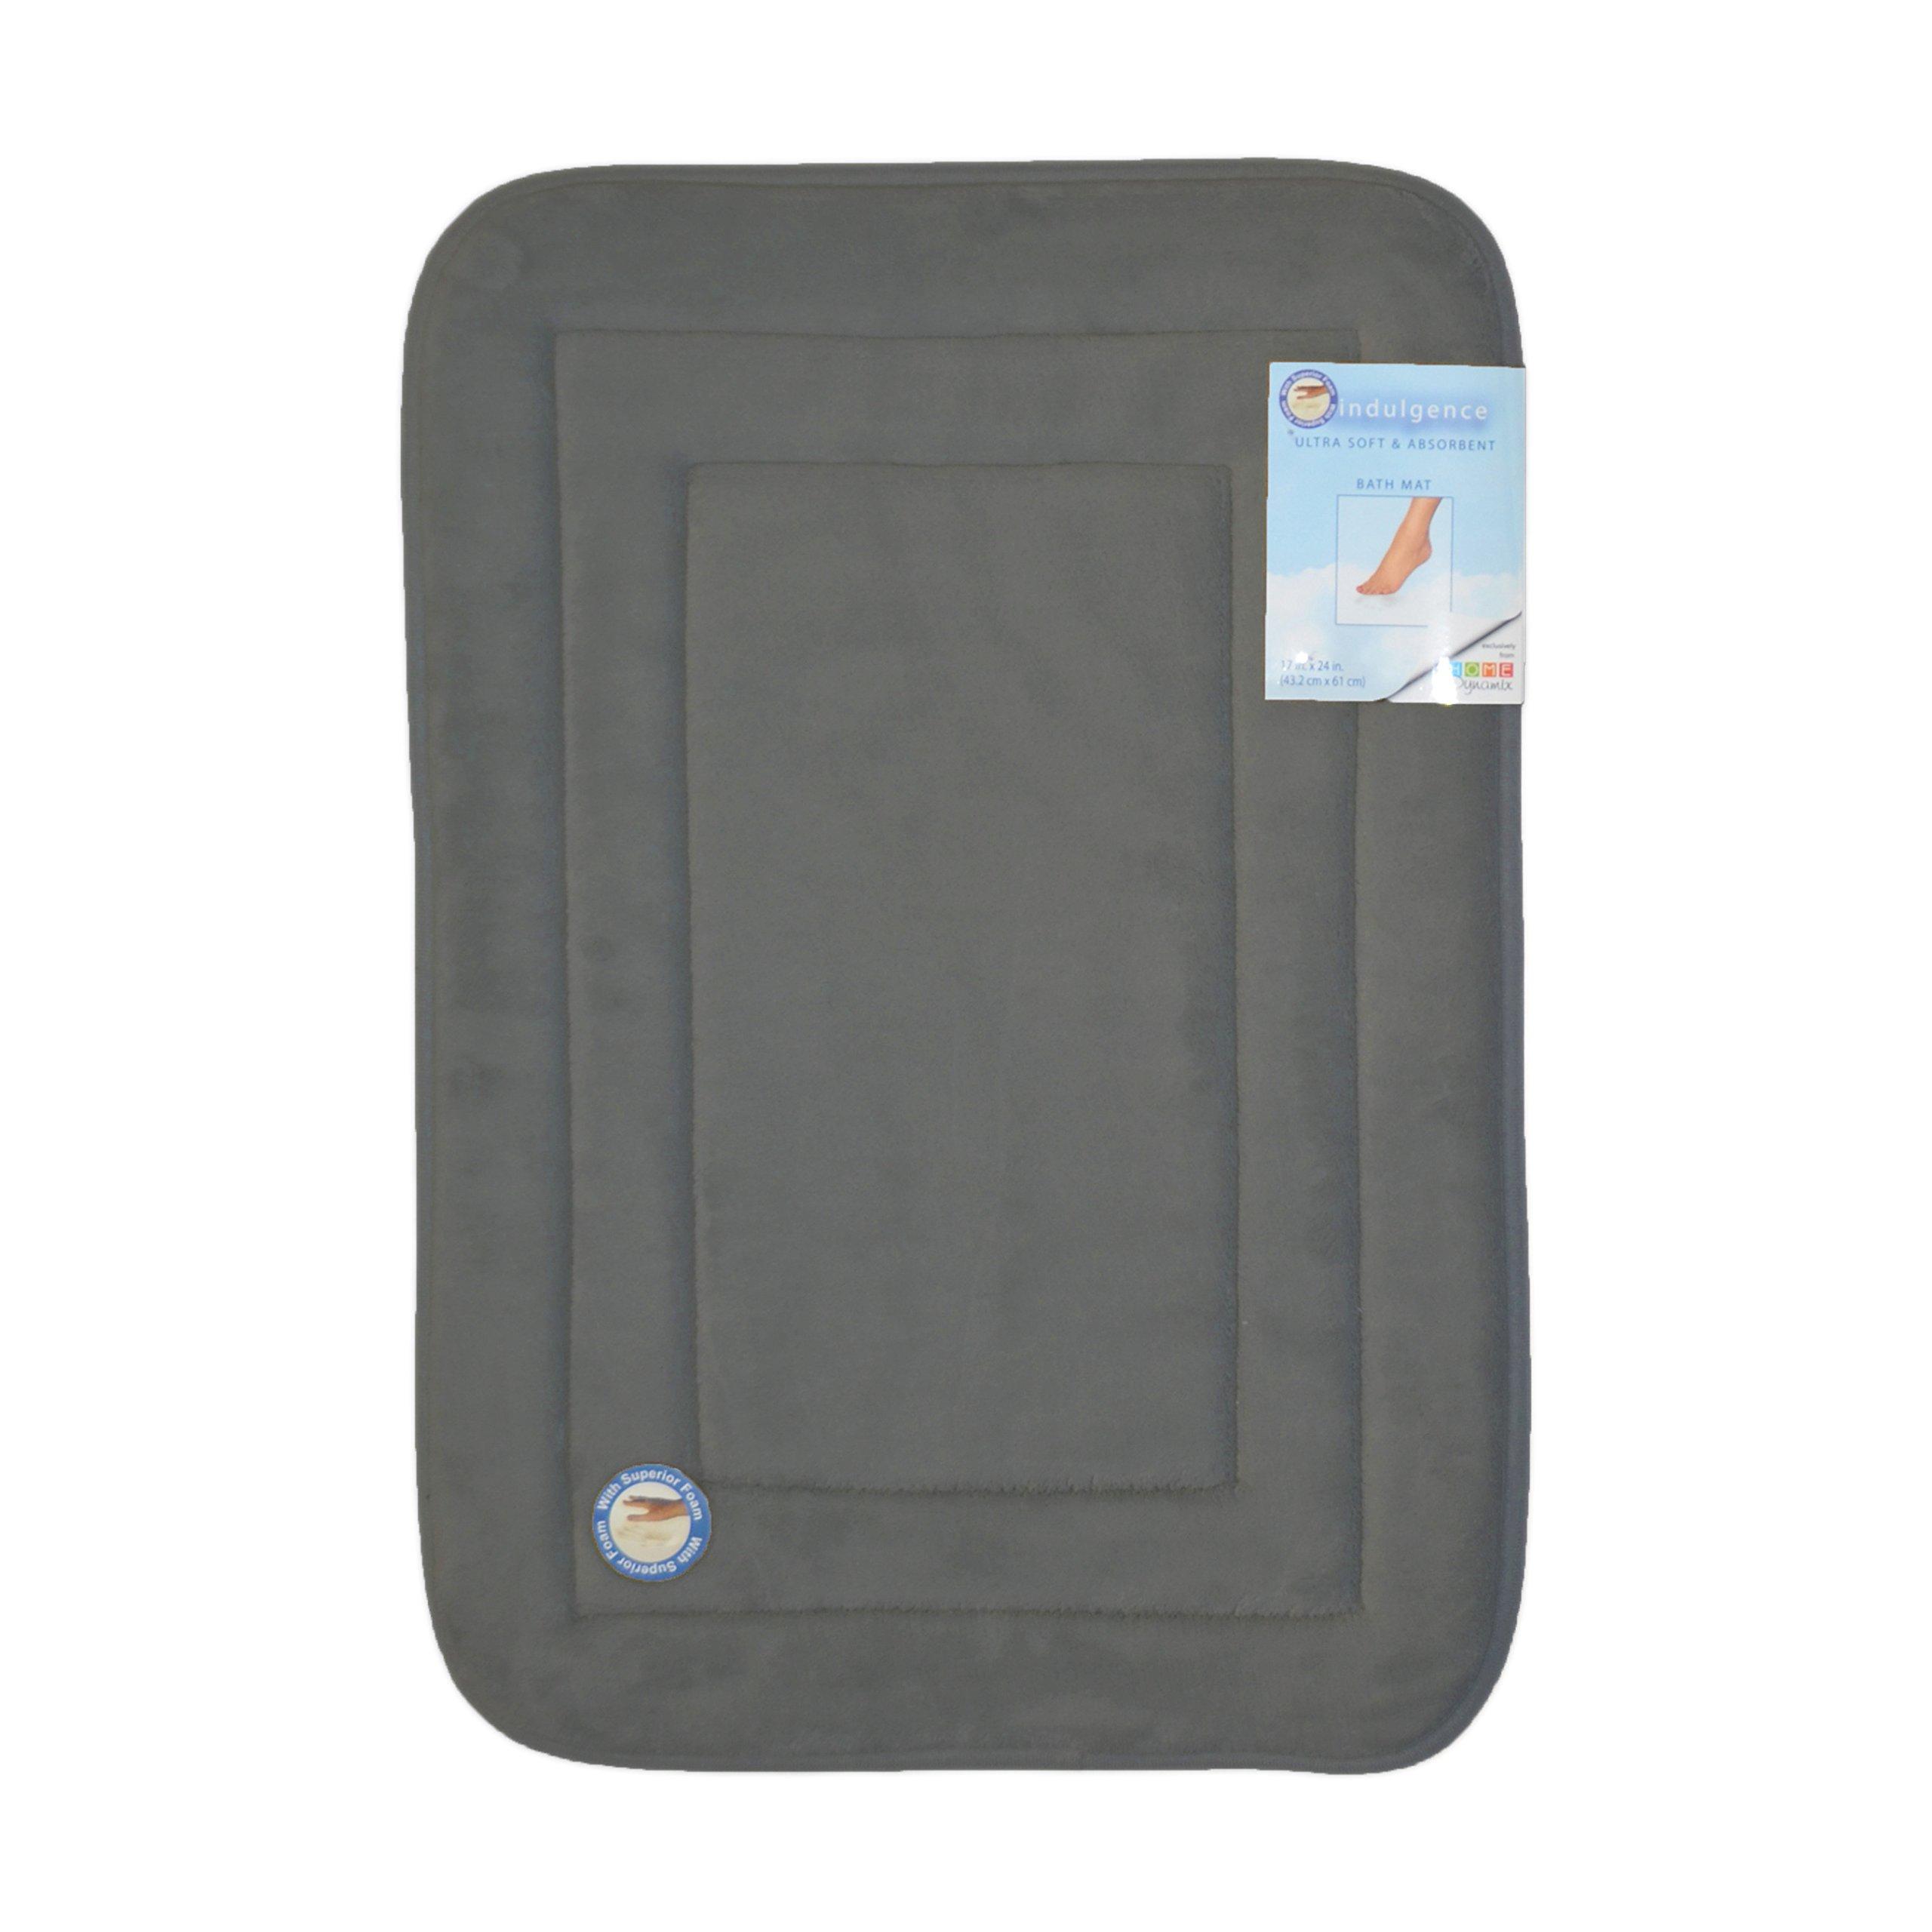 Dark Gray Memory Foam Bath Mat/area rug: Non-skid, Absorbent, 17 X 24 or 20 X 30 (Racetrack, 20x30)